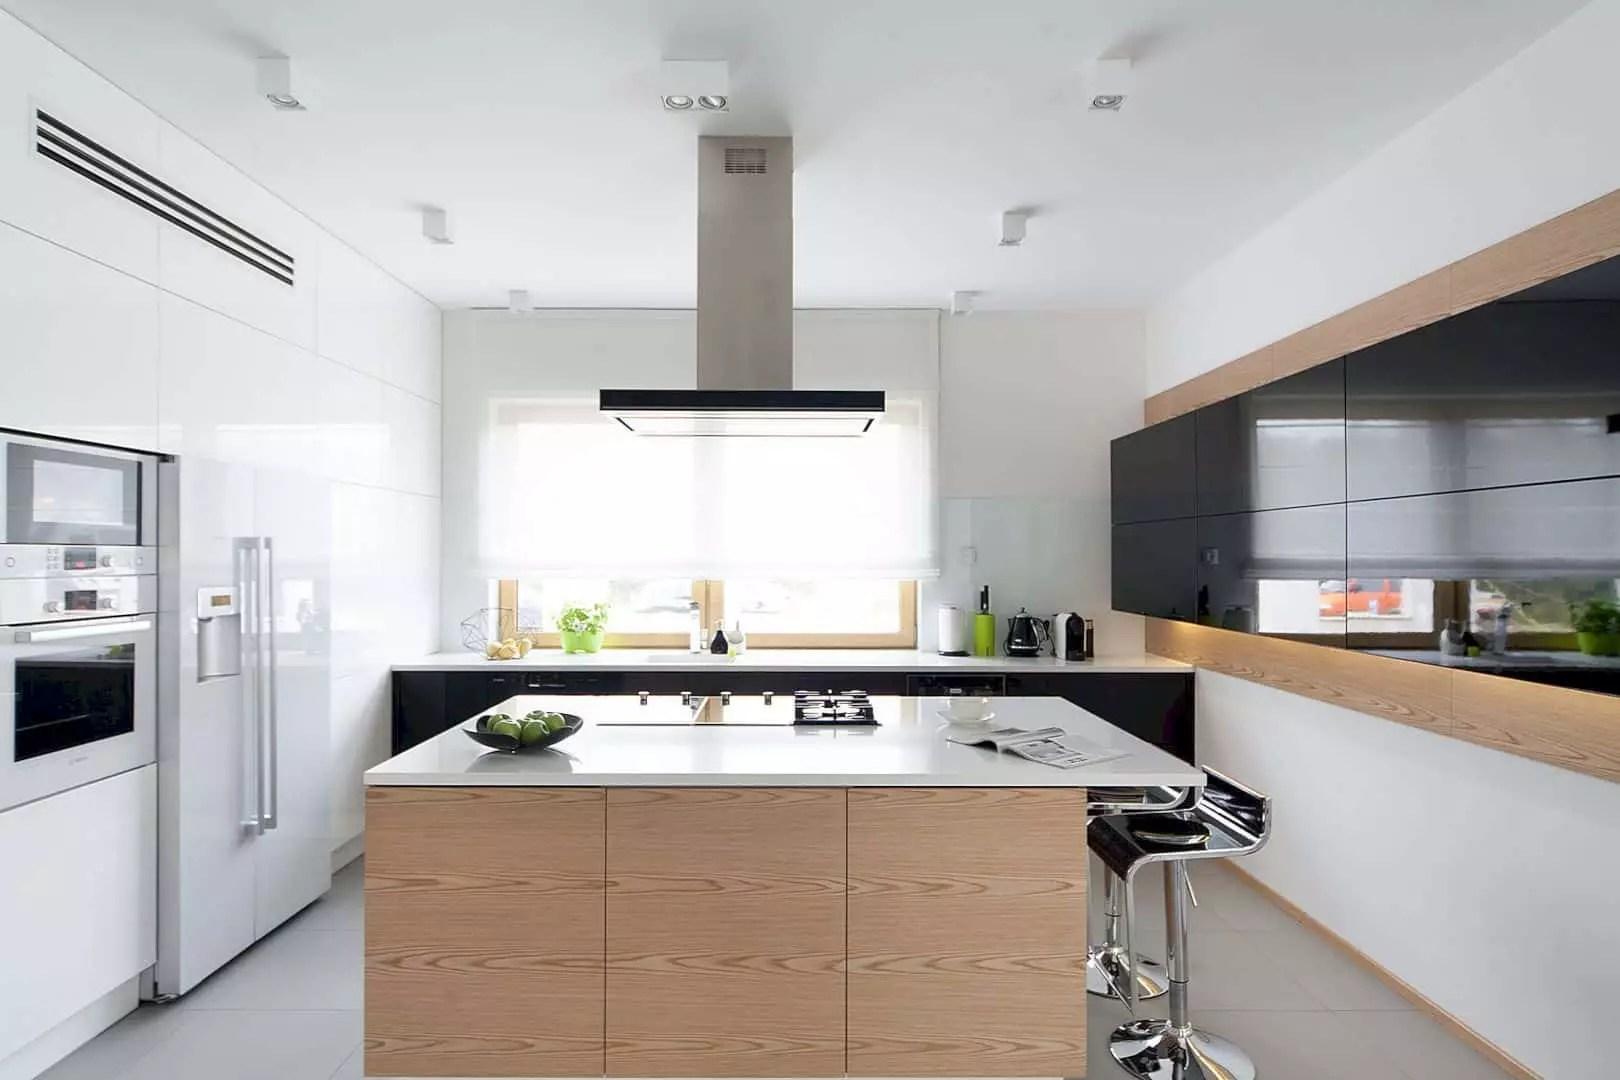 Willa W Jaworznie: Monochromatic Color Design with Modern Interior in A Minimalist House